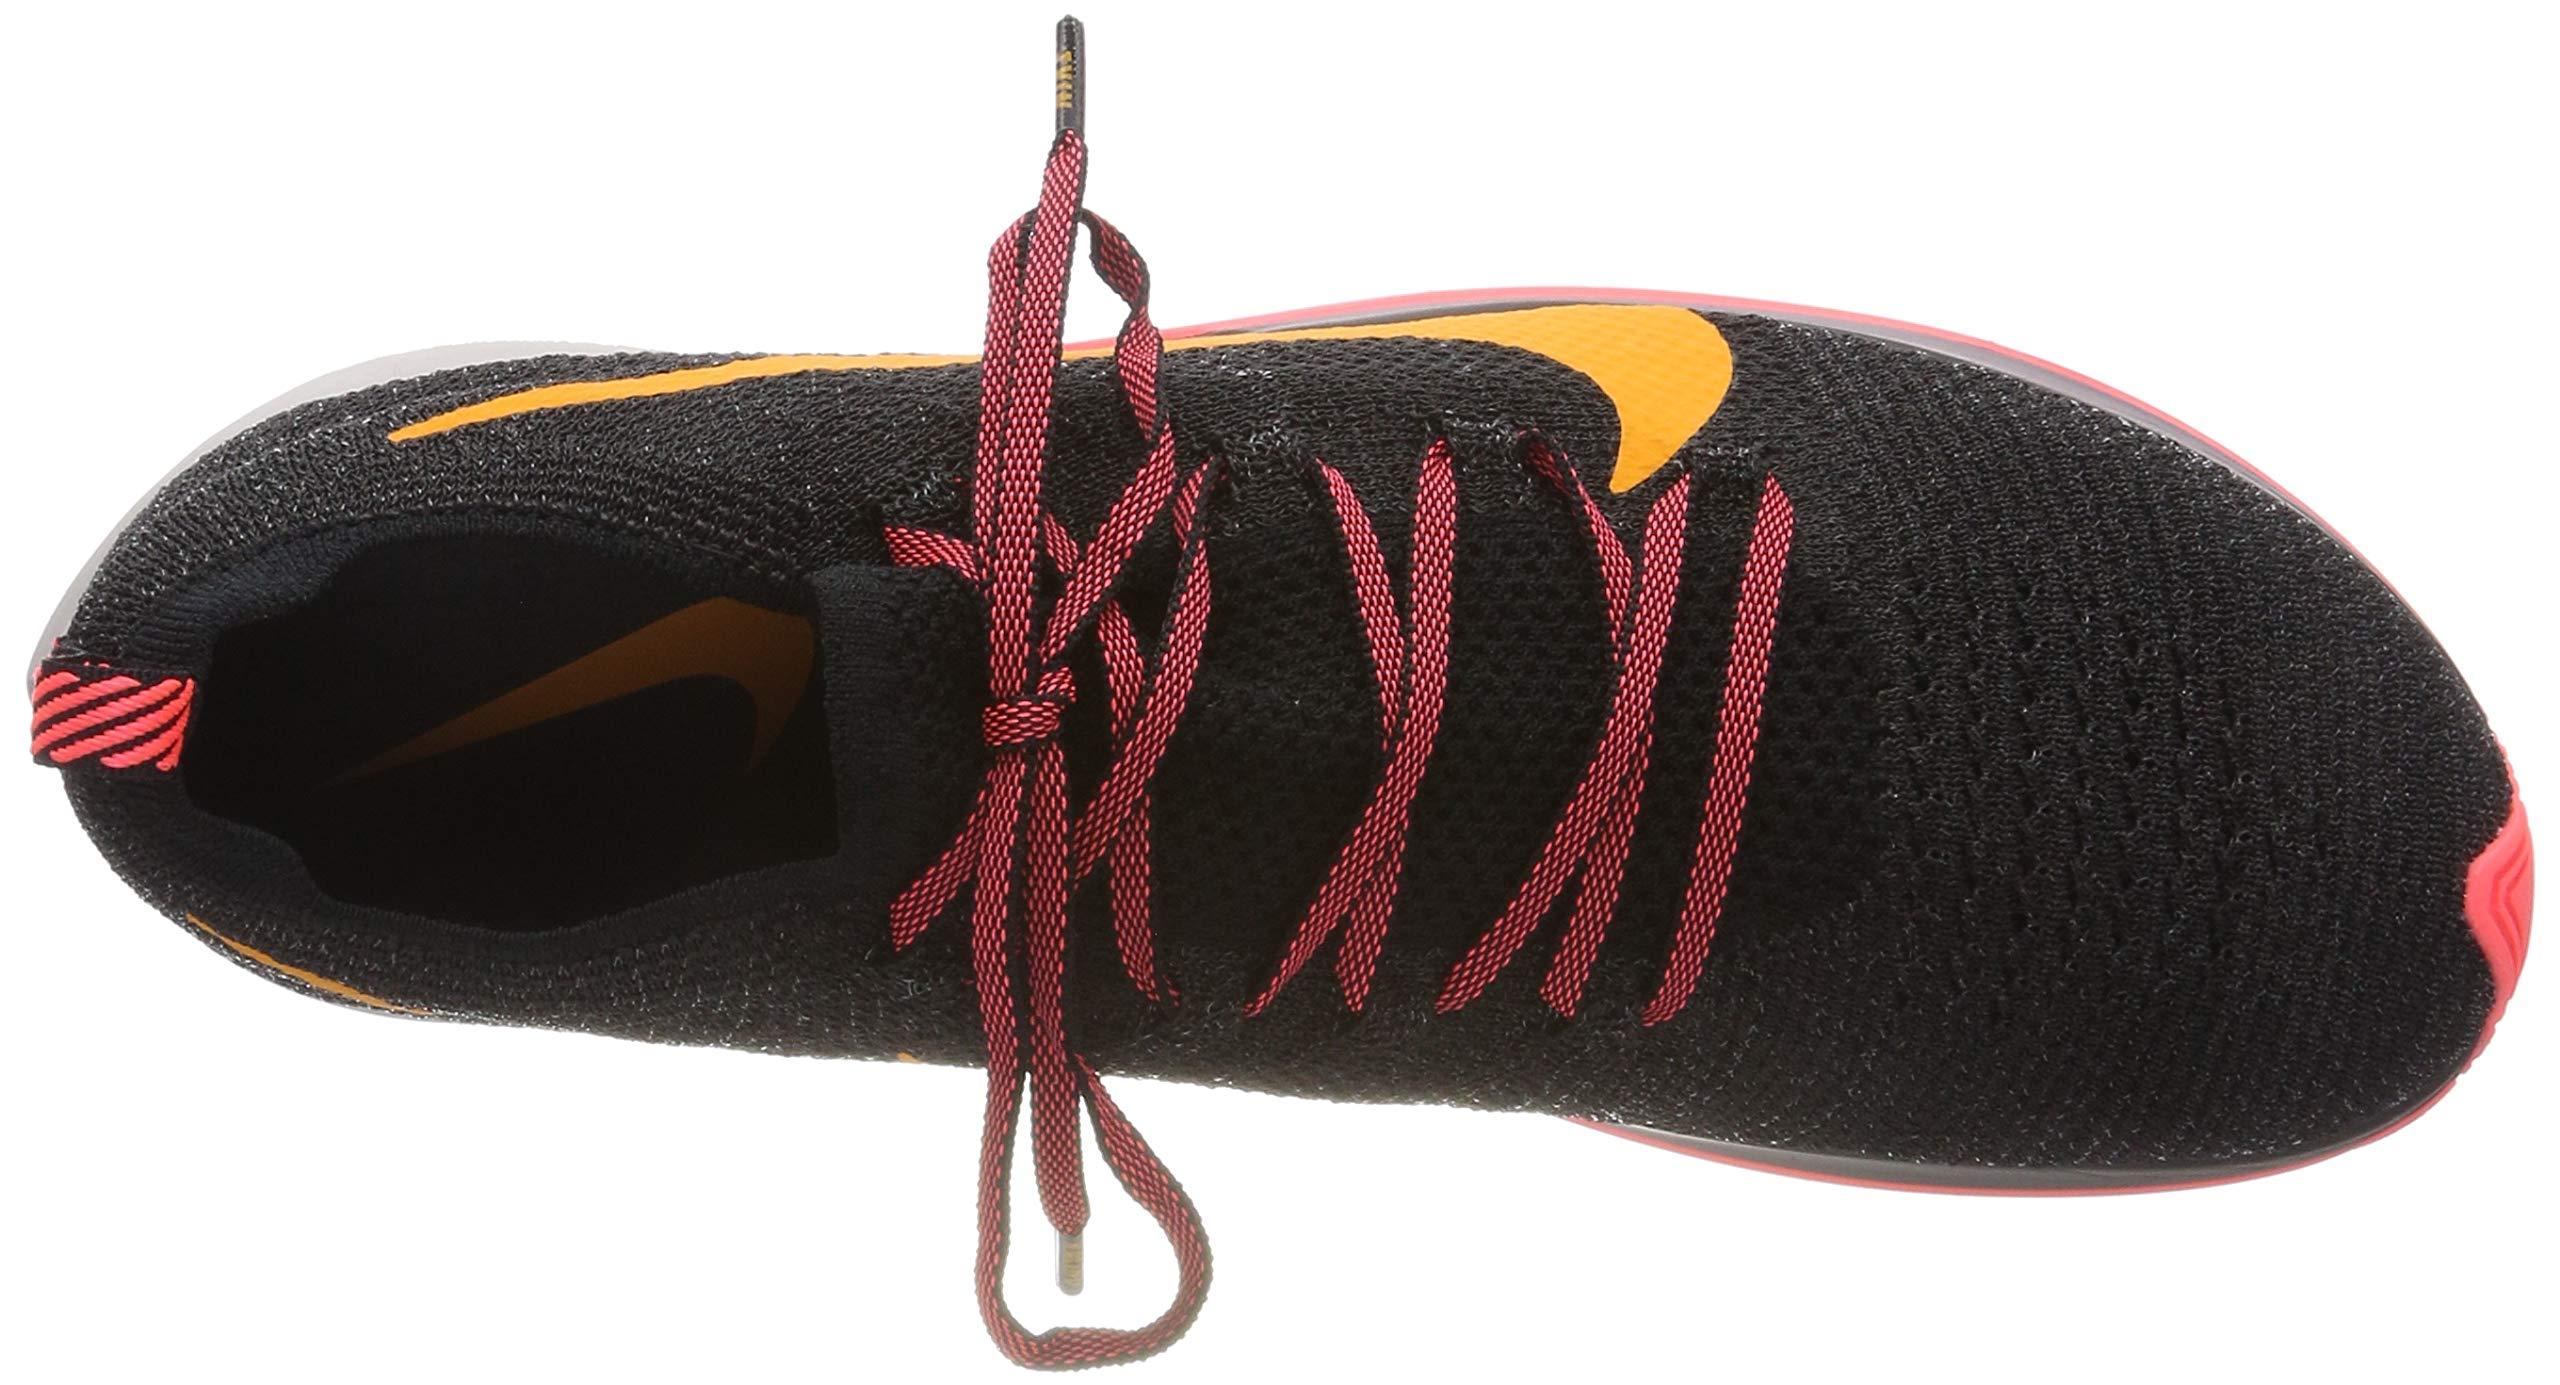 Nike Zoom Fly Flyknit Men's Running Shoe Black/Orange Peel-Flash Crimson Size 8 M US by Nike (Image #7)